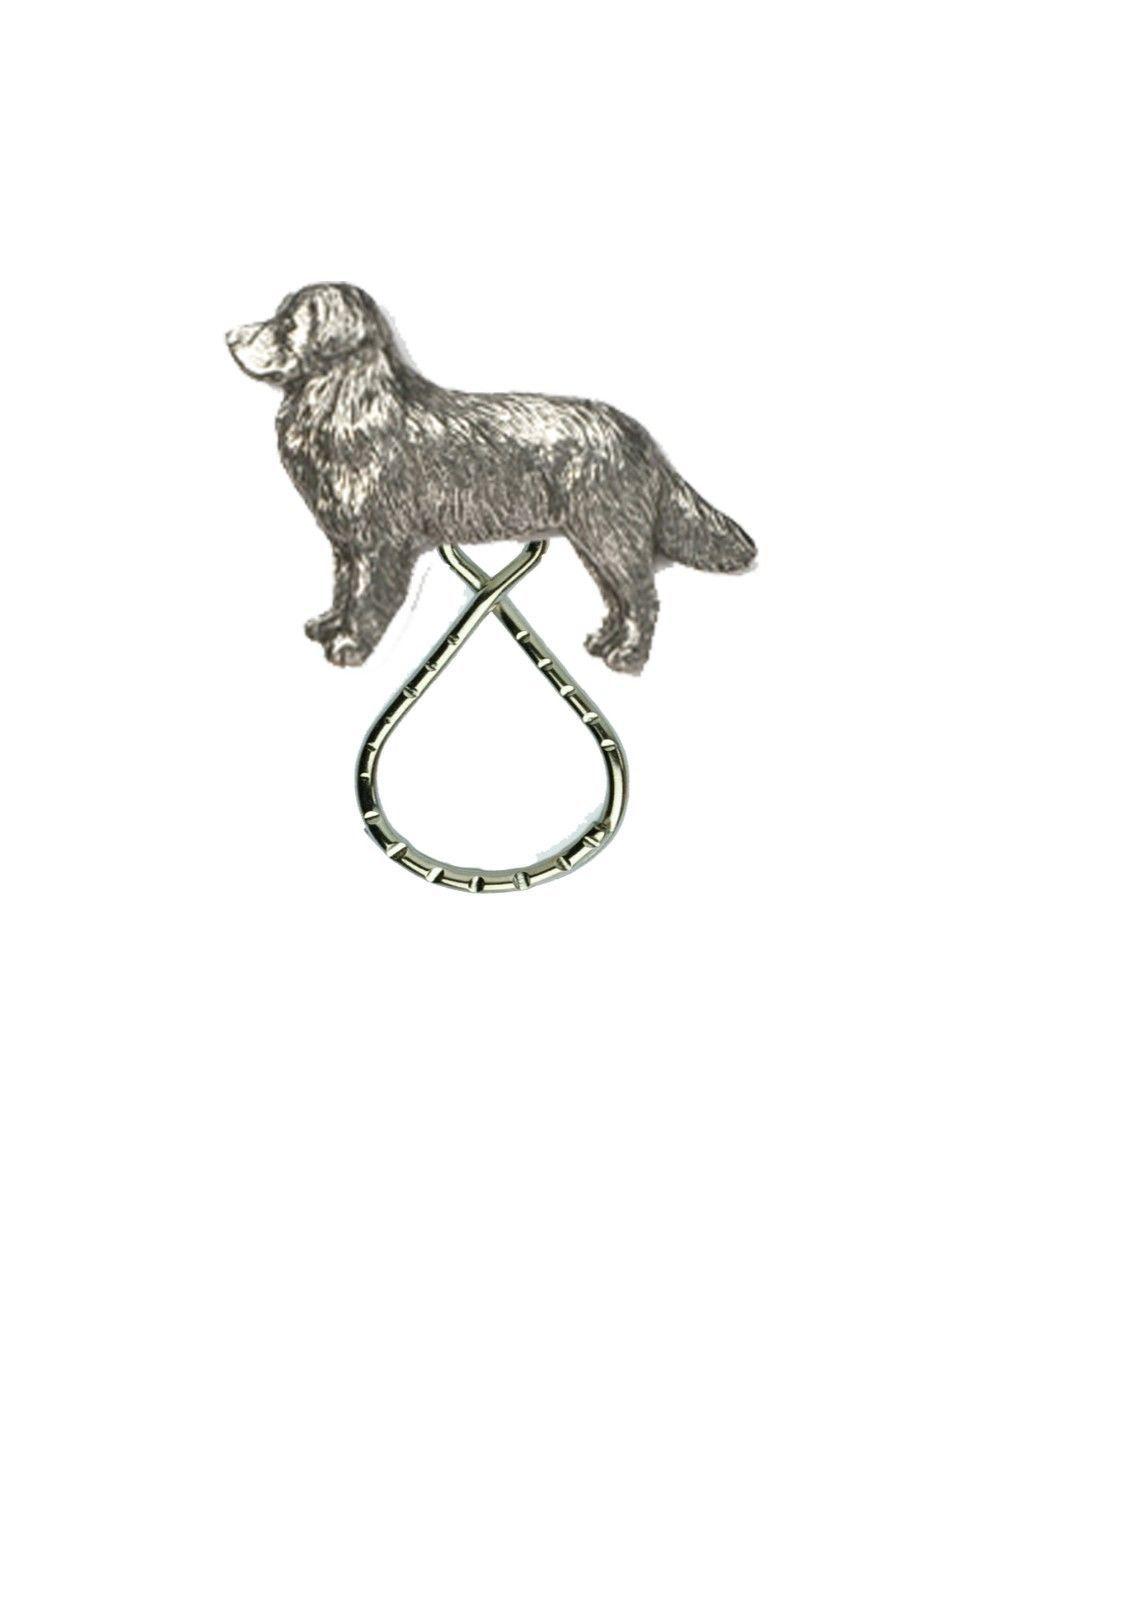 Bernese Mountain Dog Pewter Emblem On Brooch Drop Hoop